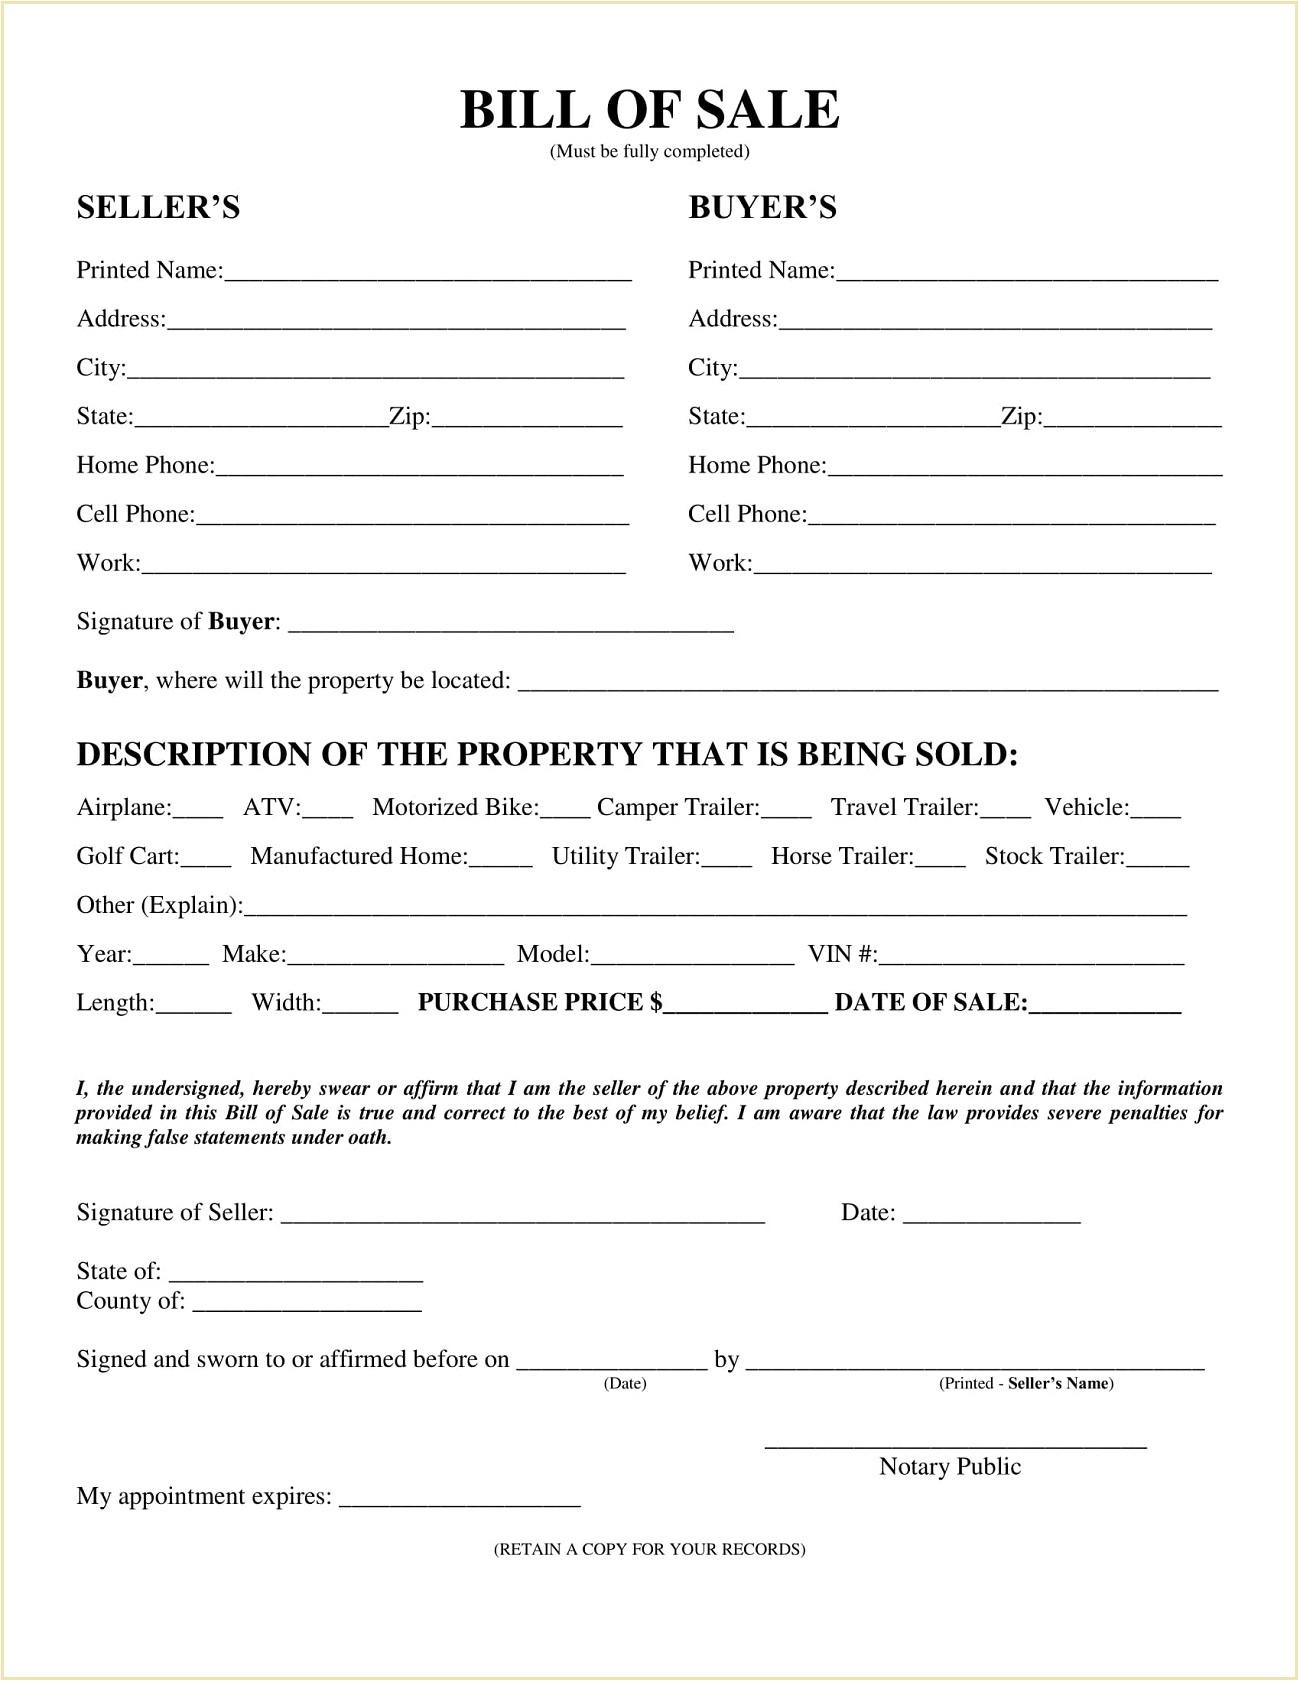 Barton County Kansas Motor Vehicle Bill of Sale Template PDF